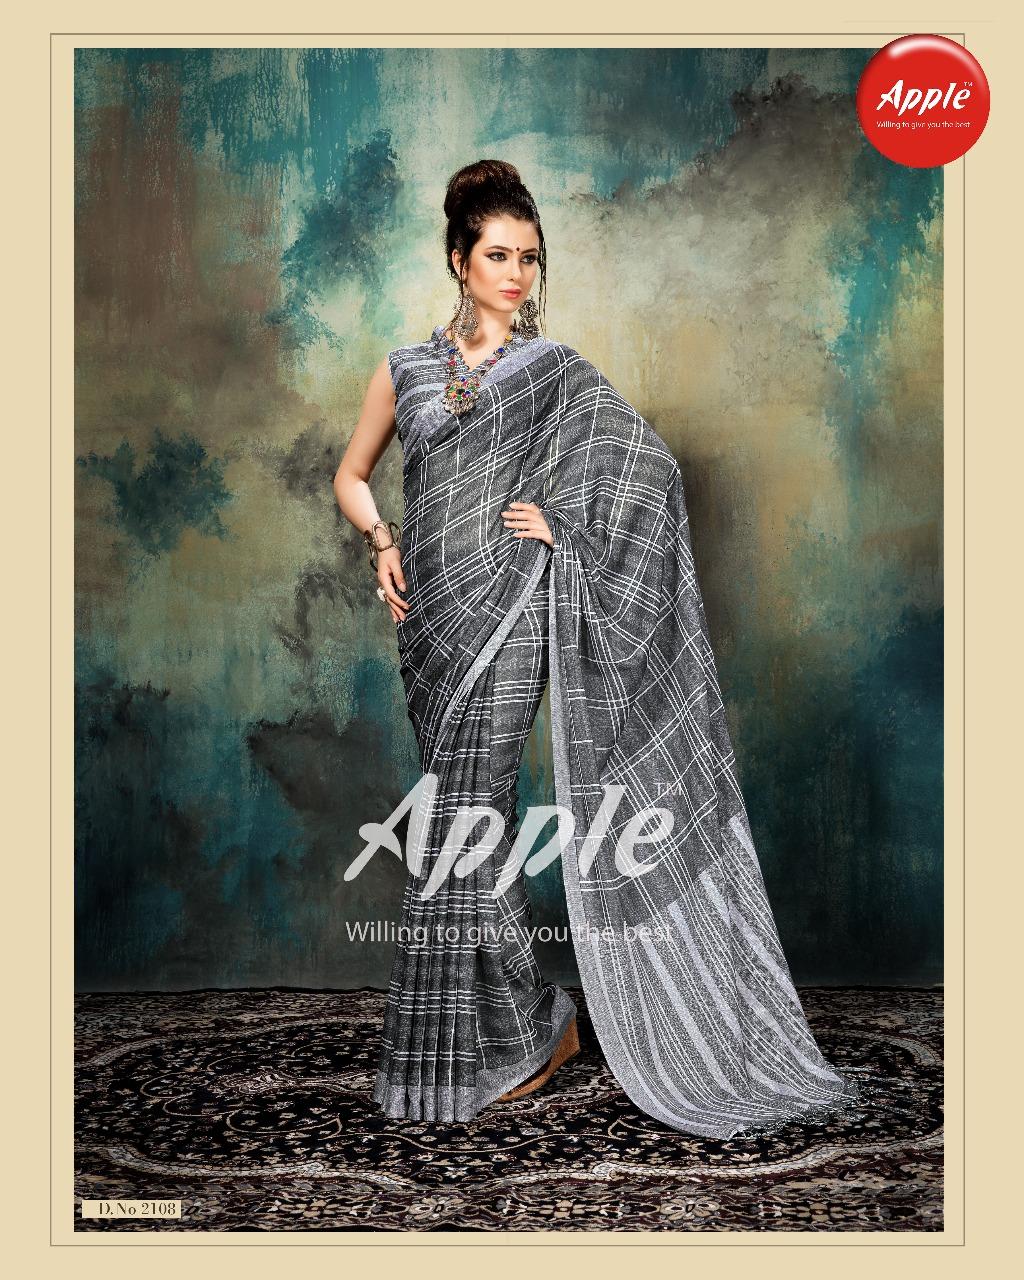 Apple Subhuhi 2108